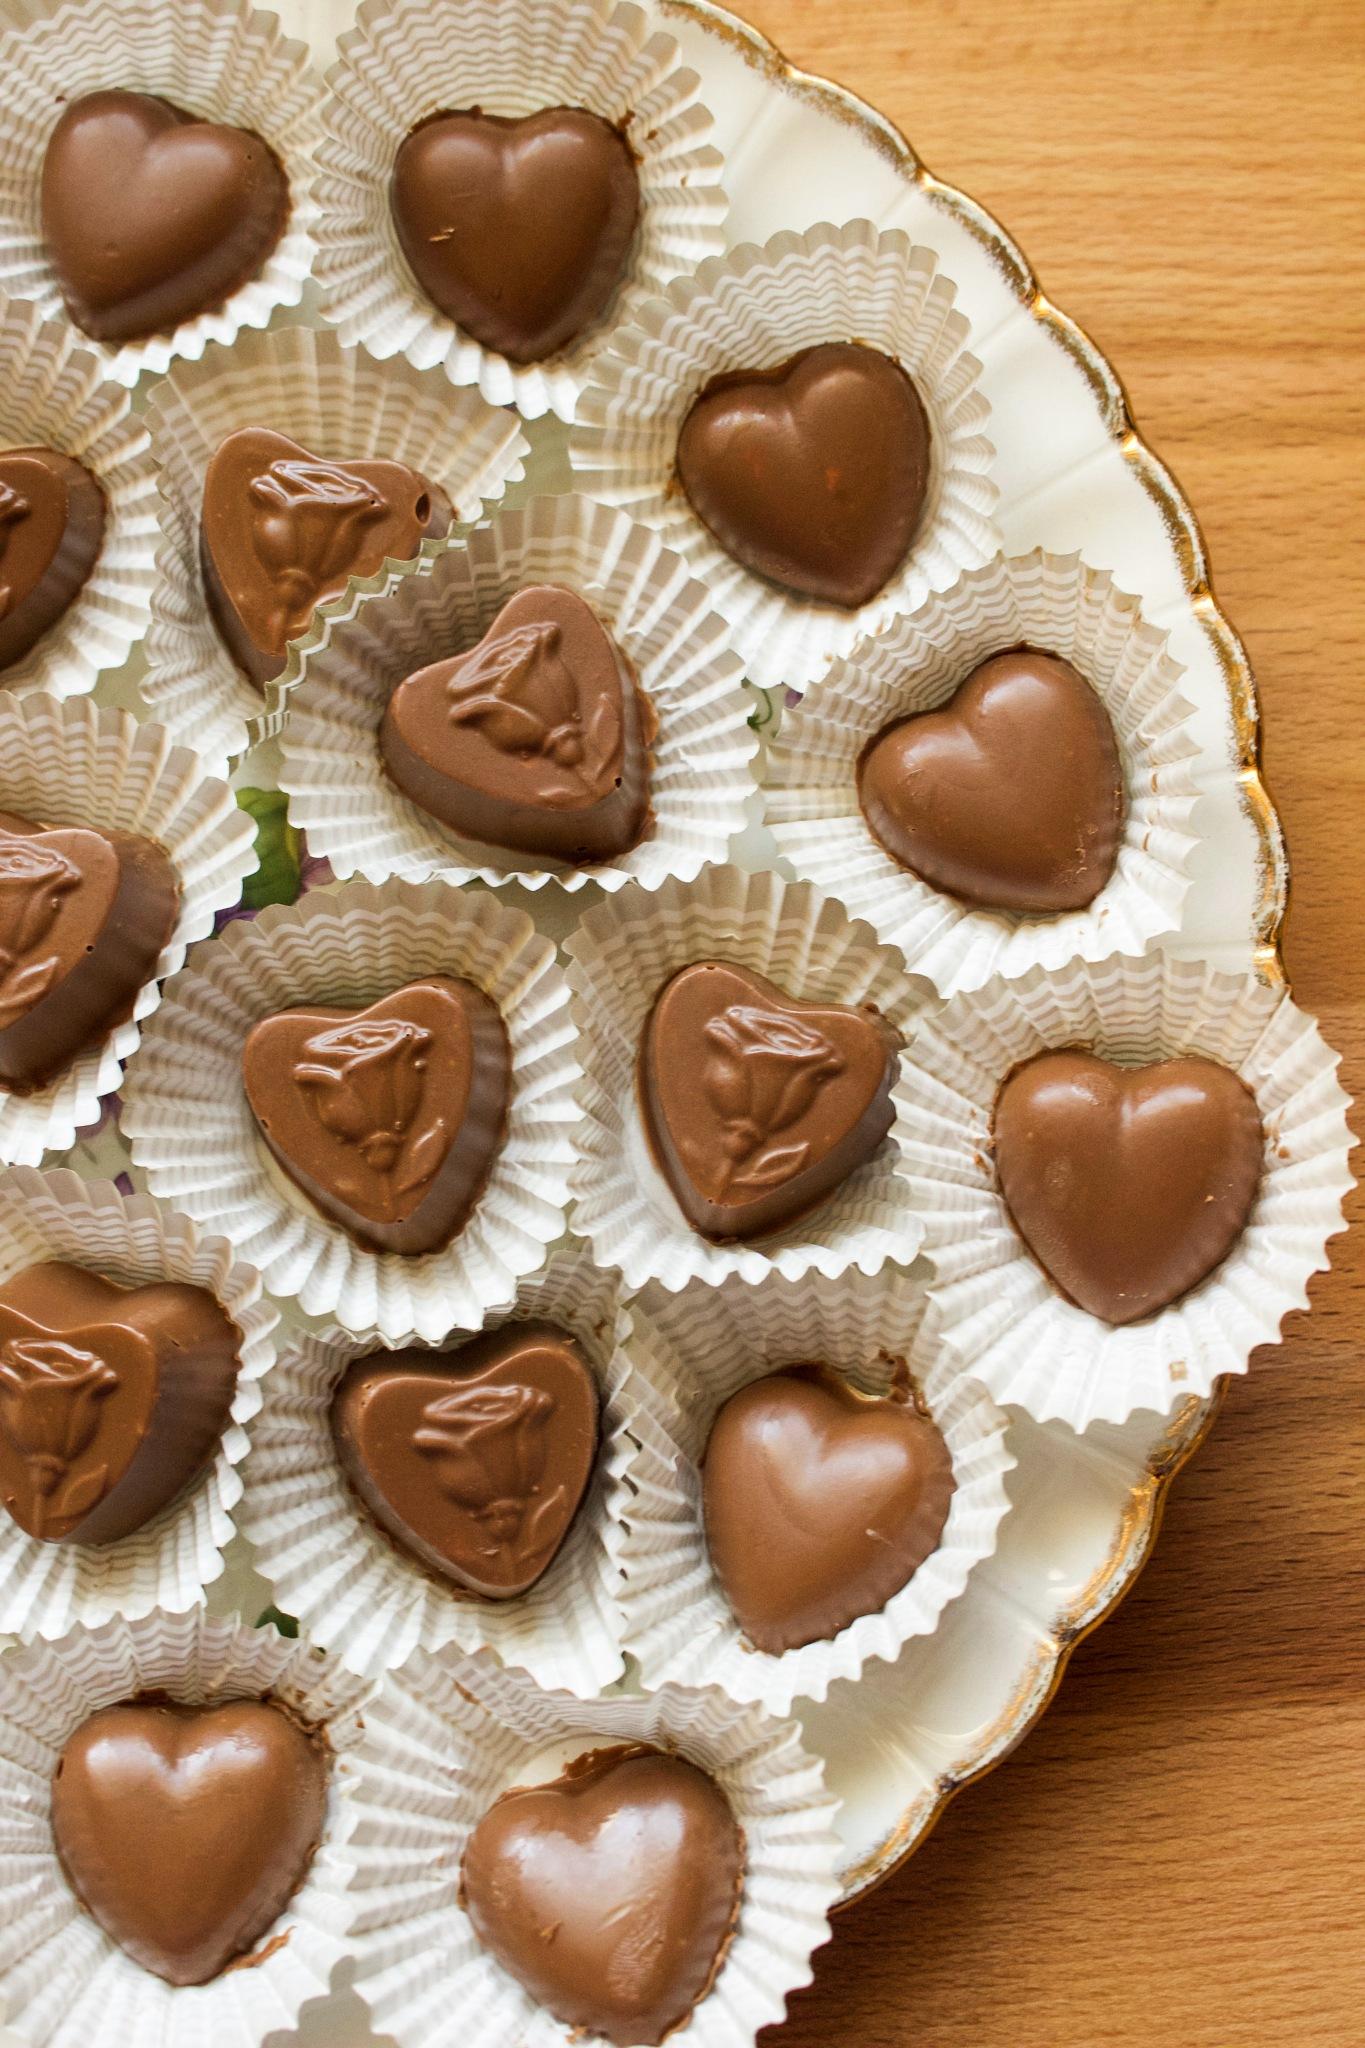 Strawberry Milk Chocolates by Suzie Ridler